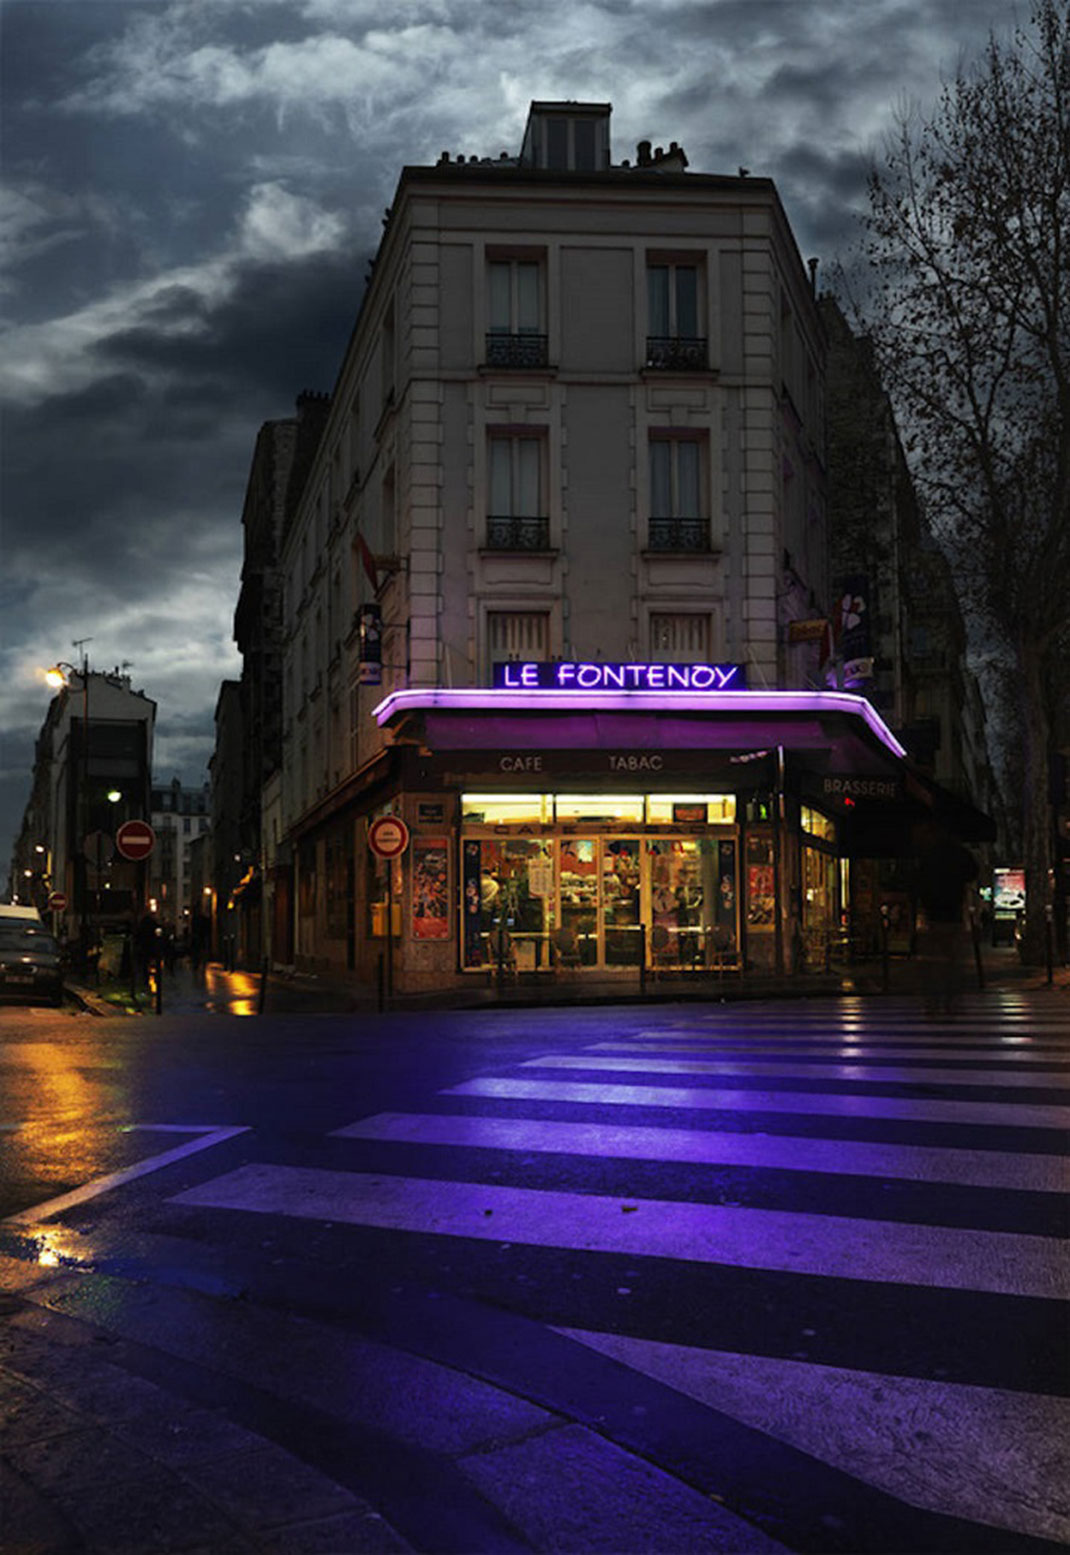 Le Fontenoy, Paris XVIII